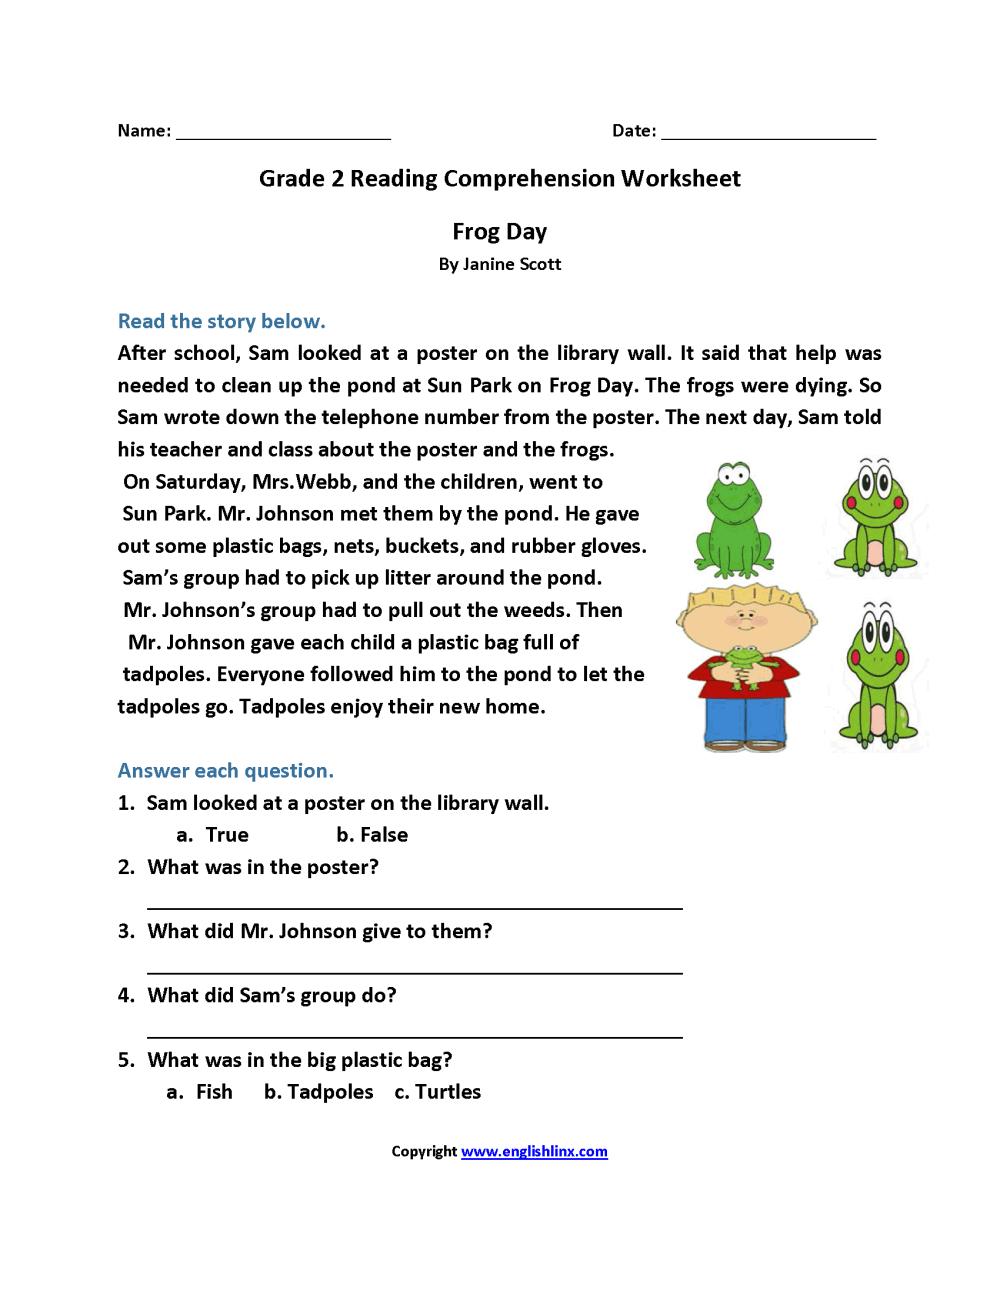 medium resolution of 11 Best Printable Comprehension Worksheets 6th Grade images on Best  Worksheets Collection